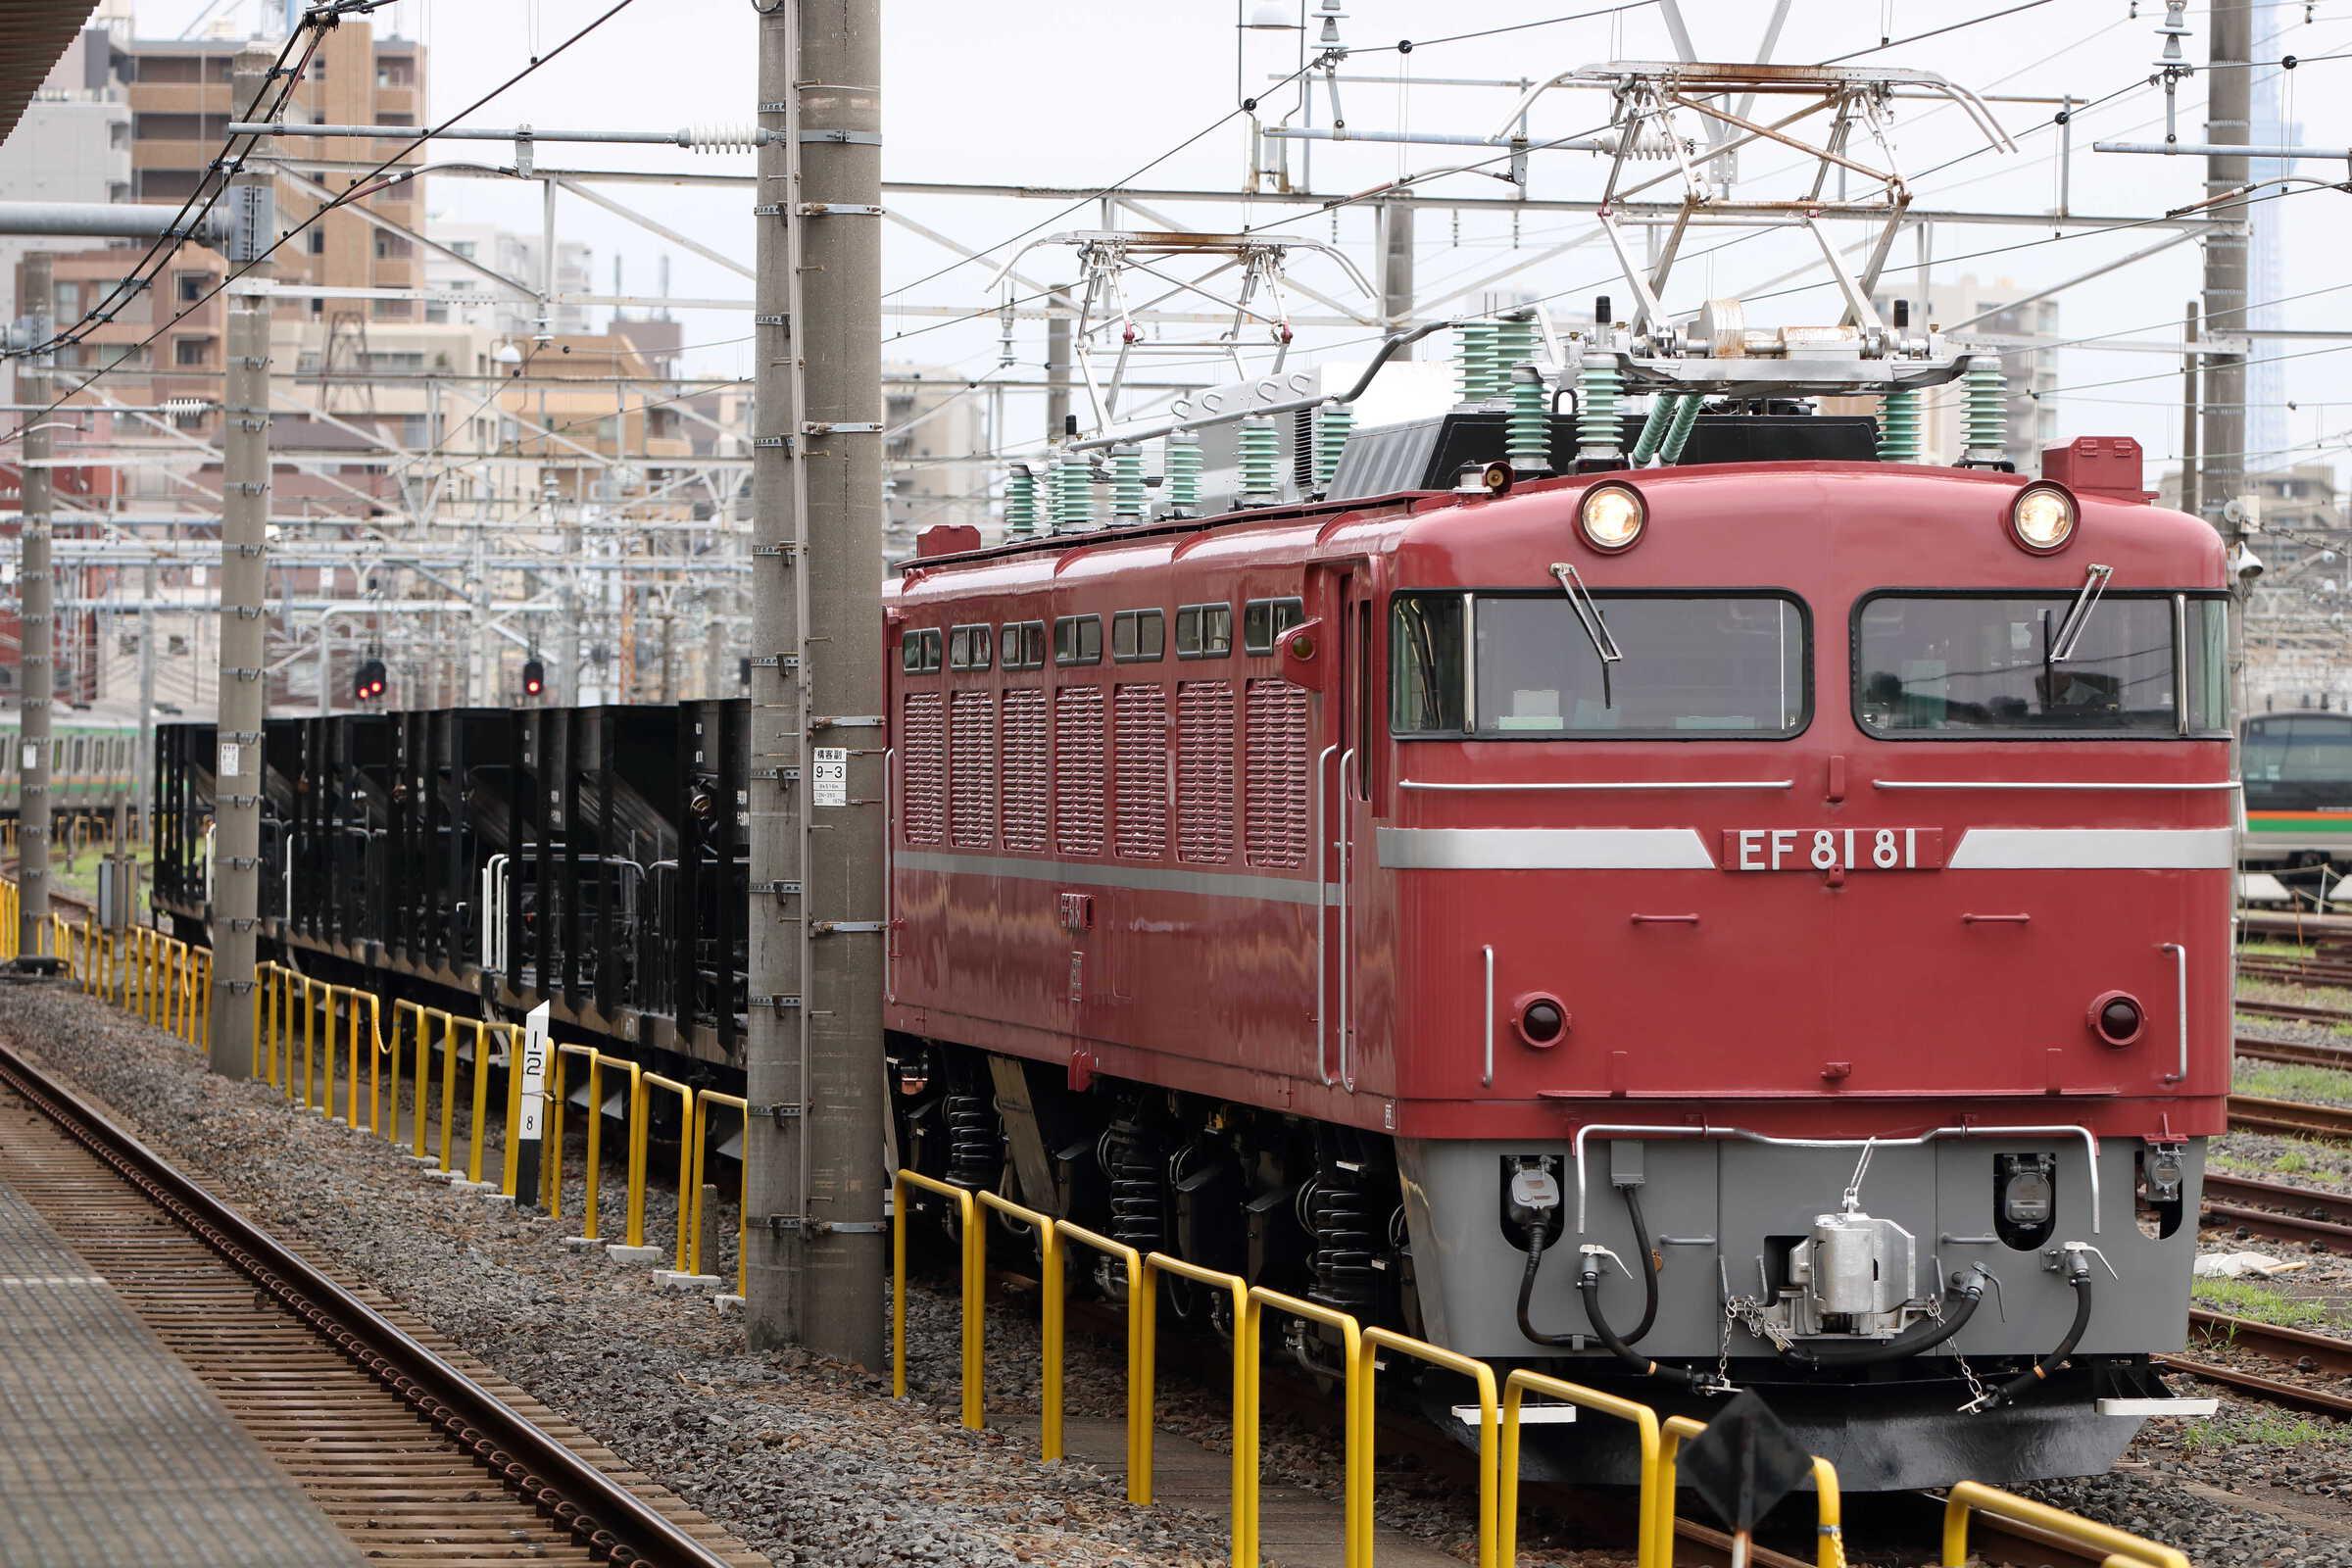 入換〜配8937列車 交検出場配給 EF81-81①[田]+ホキ6車